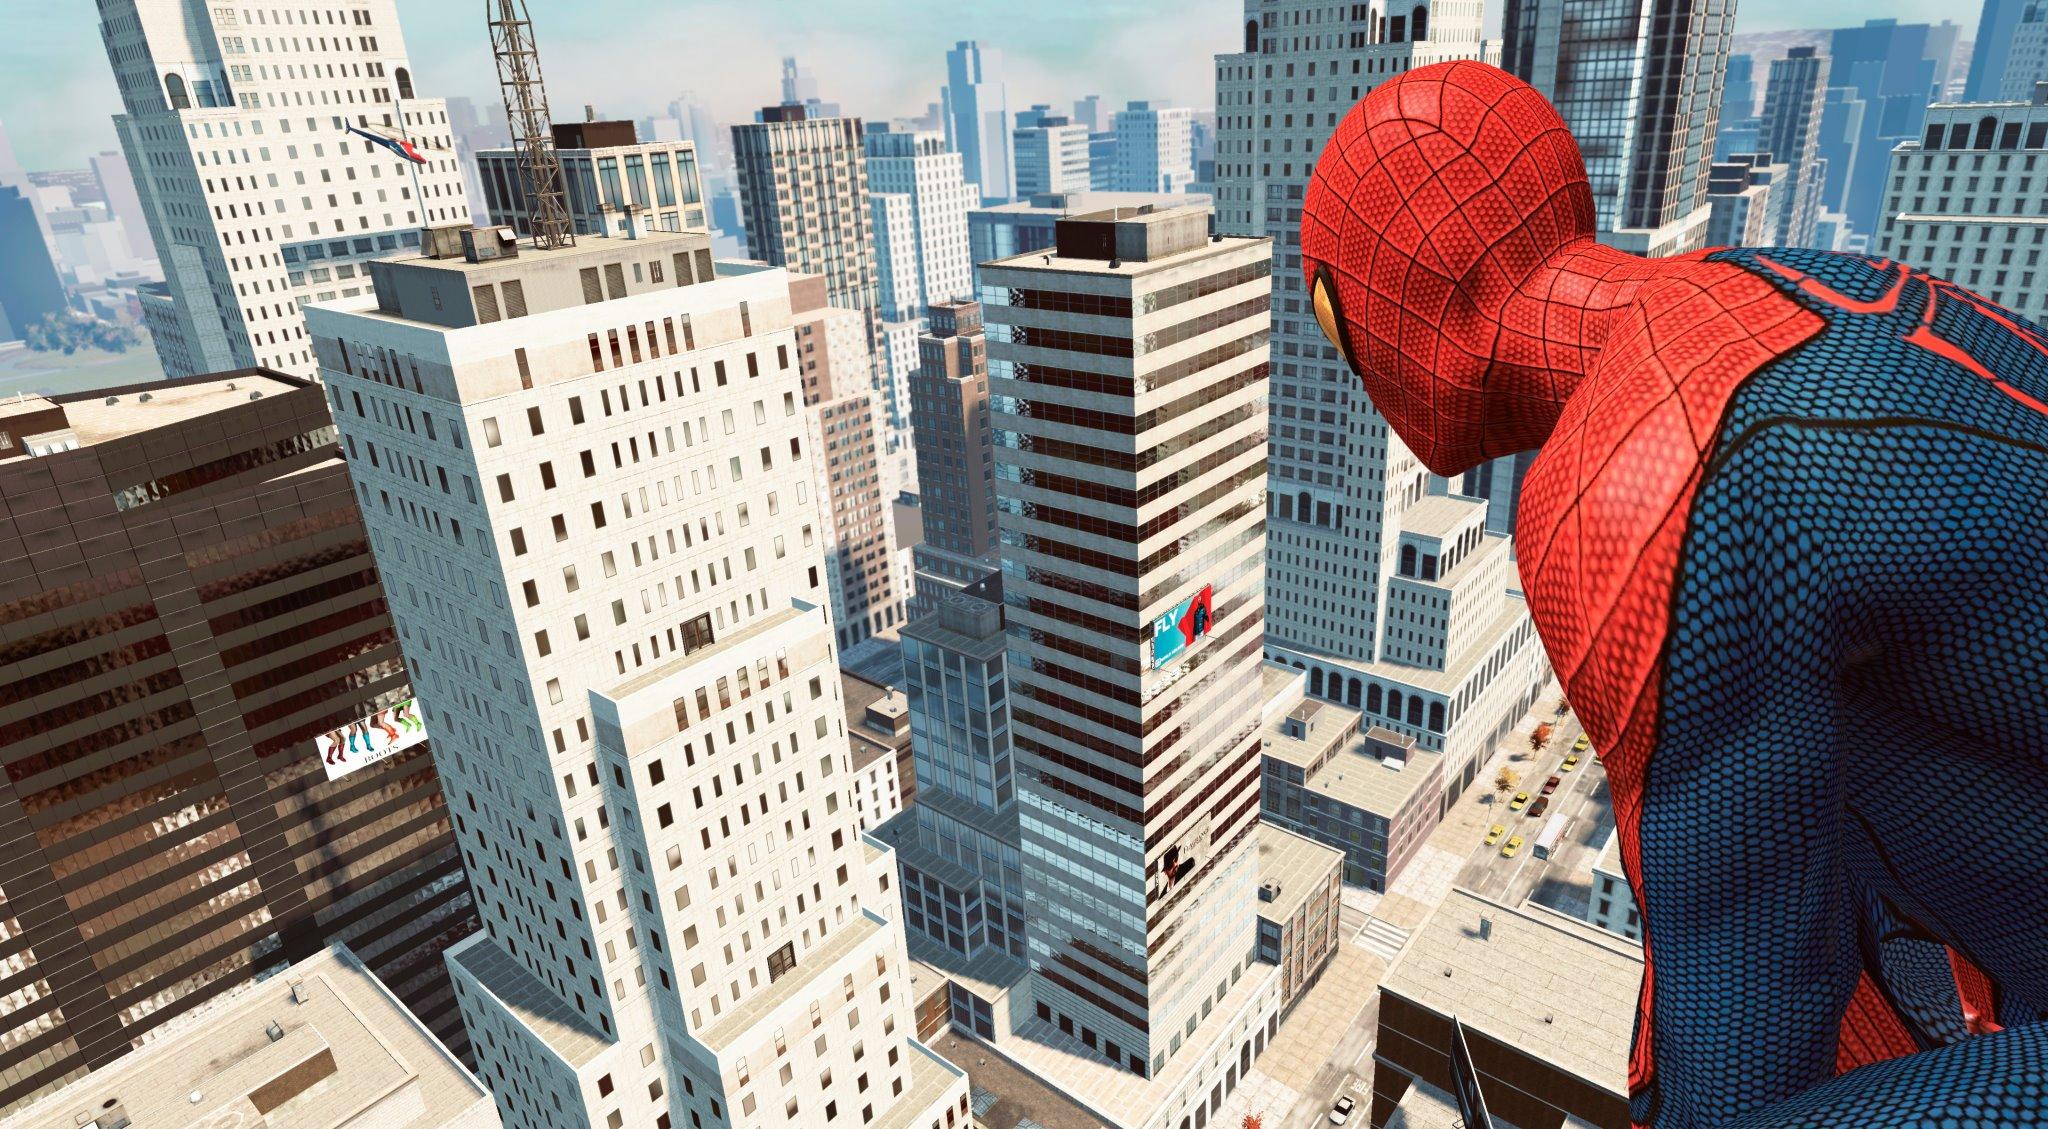 The Amazing Spider-Man screenshot 59380